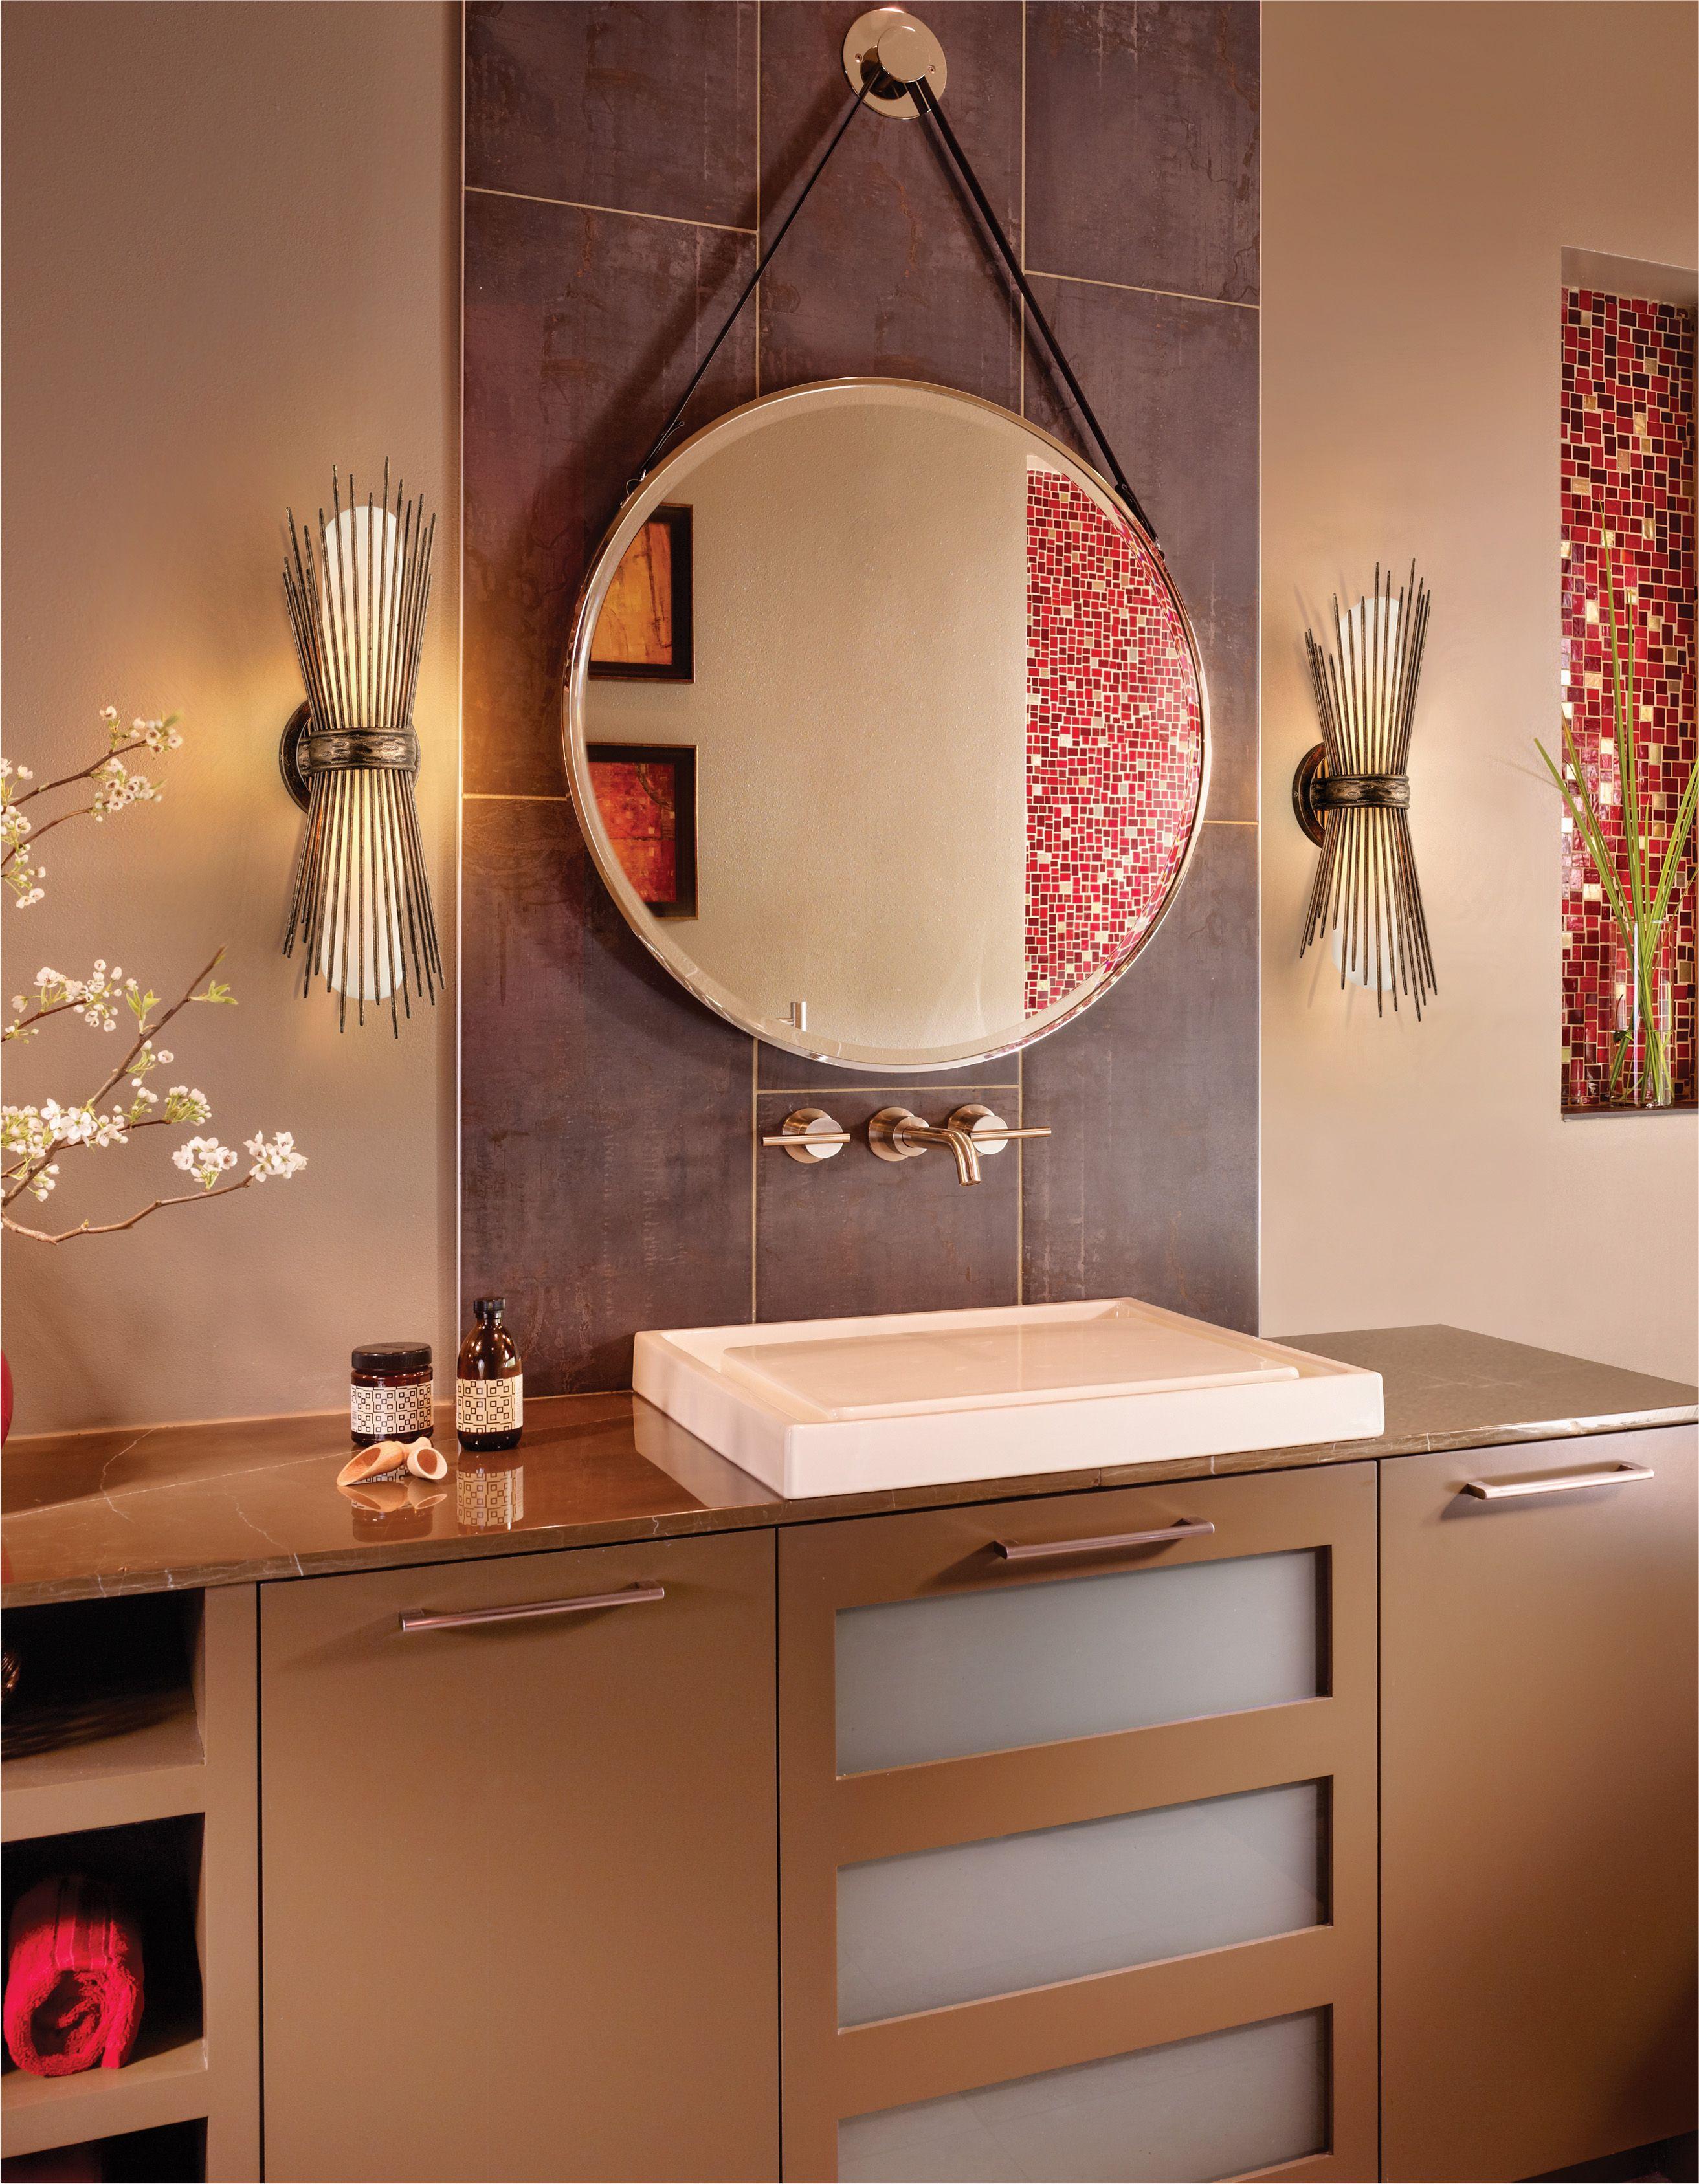 Bathroom Lighting San Diego blinktroy lighting, wall sconces, bathroom lighting, home